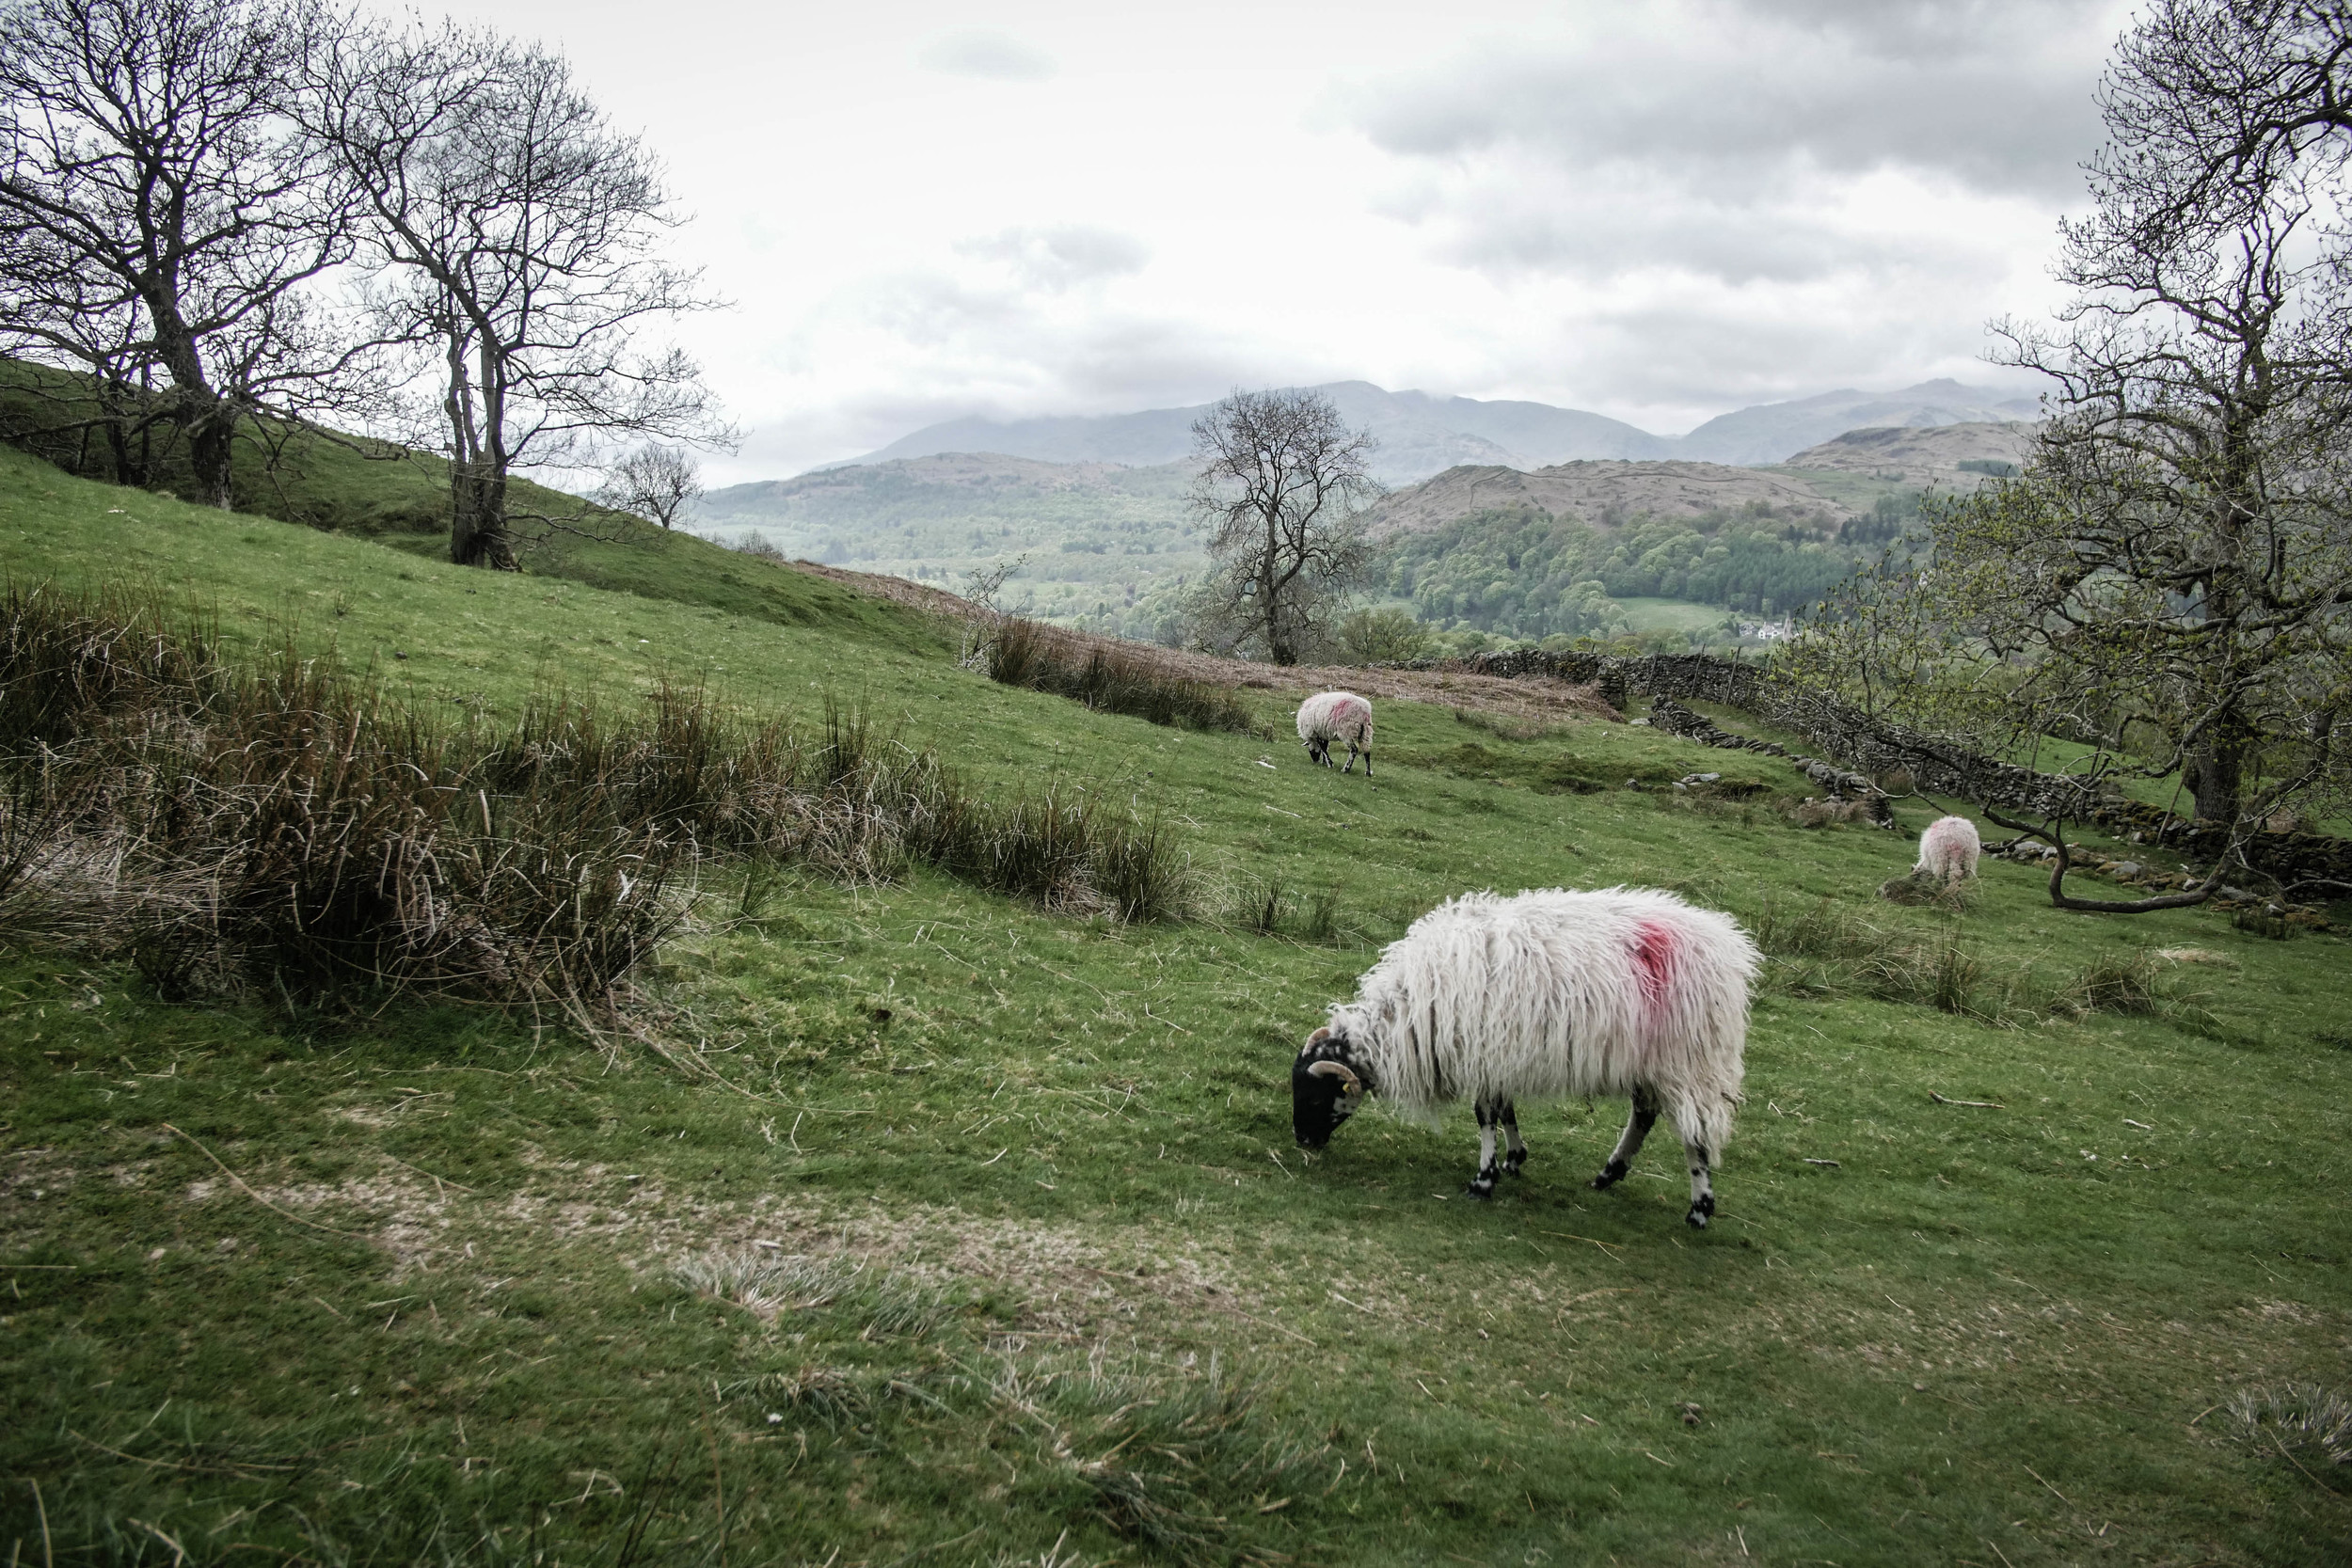 sheep-ambleside-hiking-mountain-wansfell